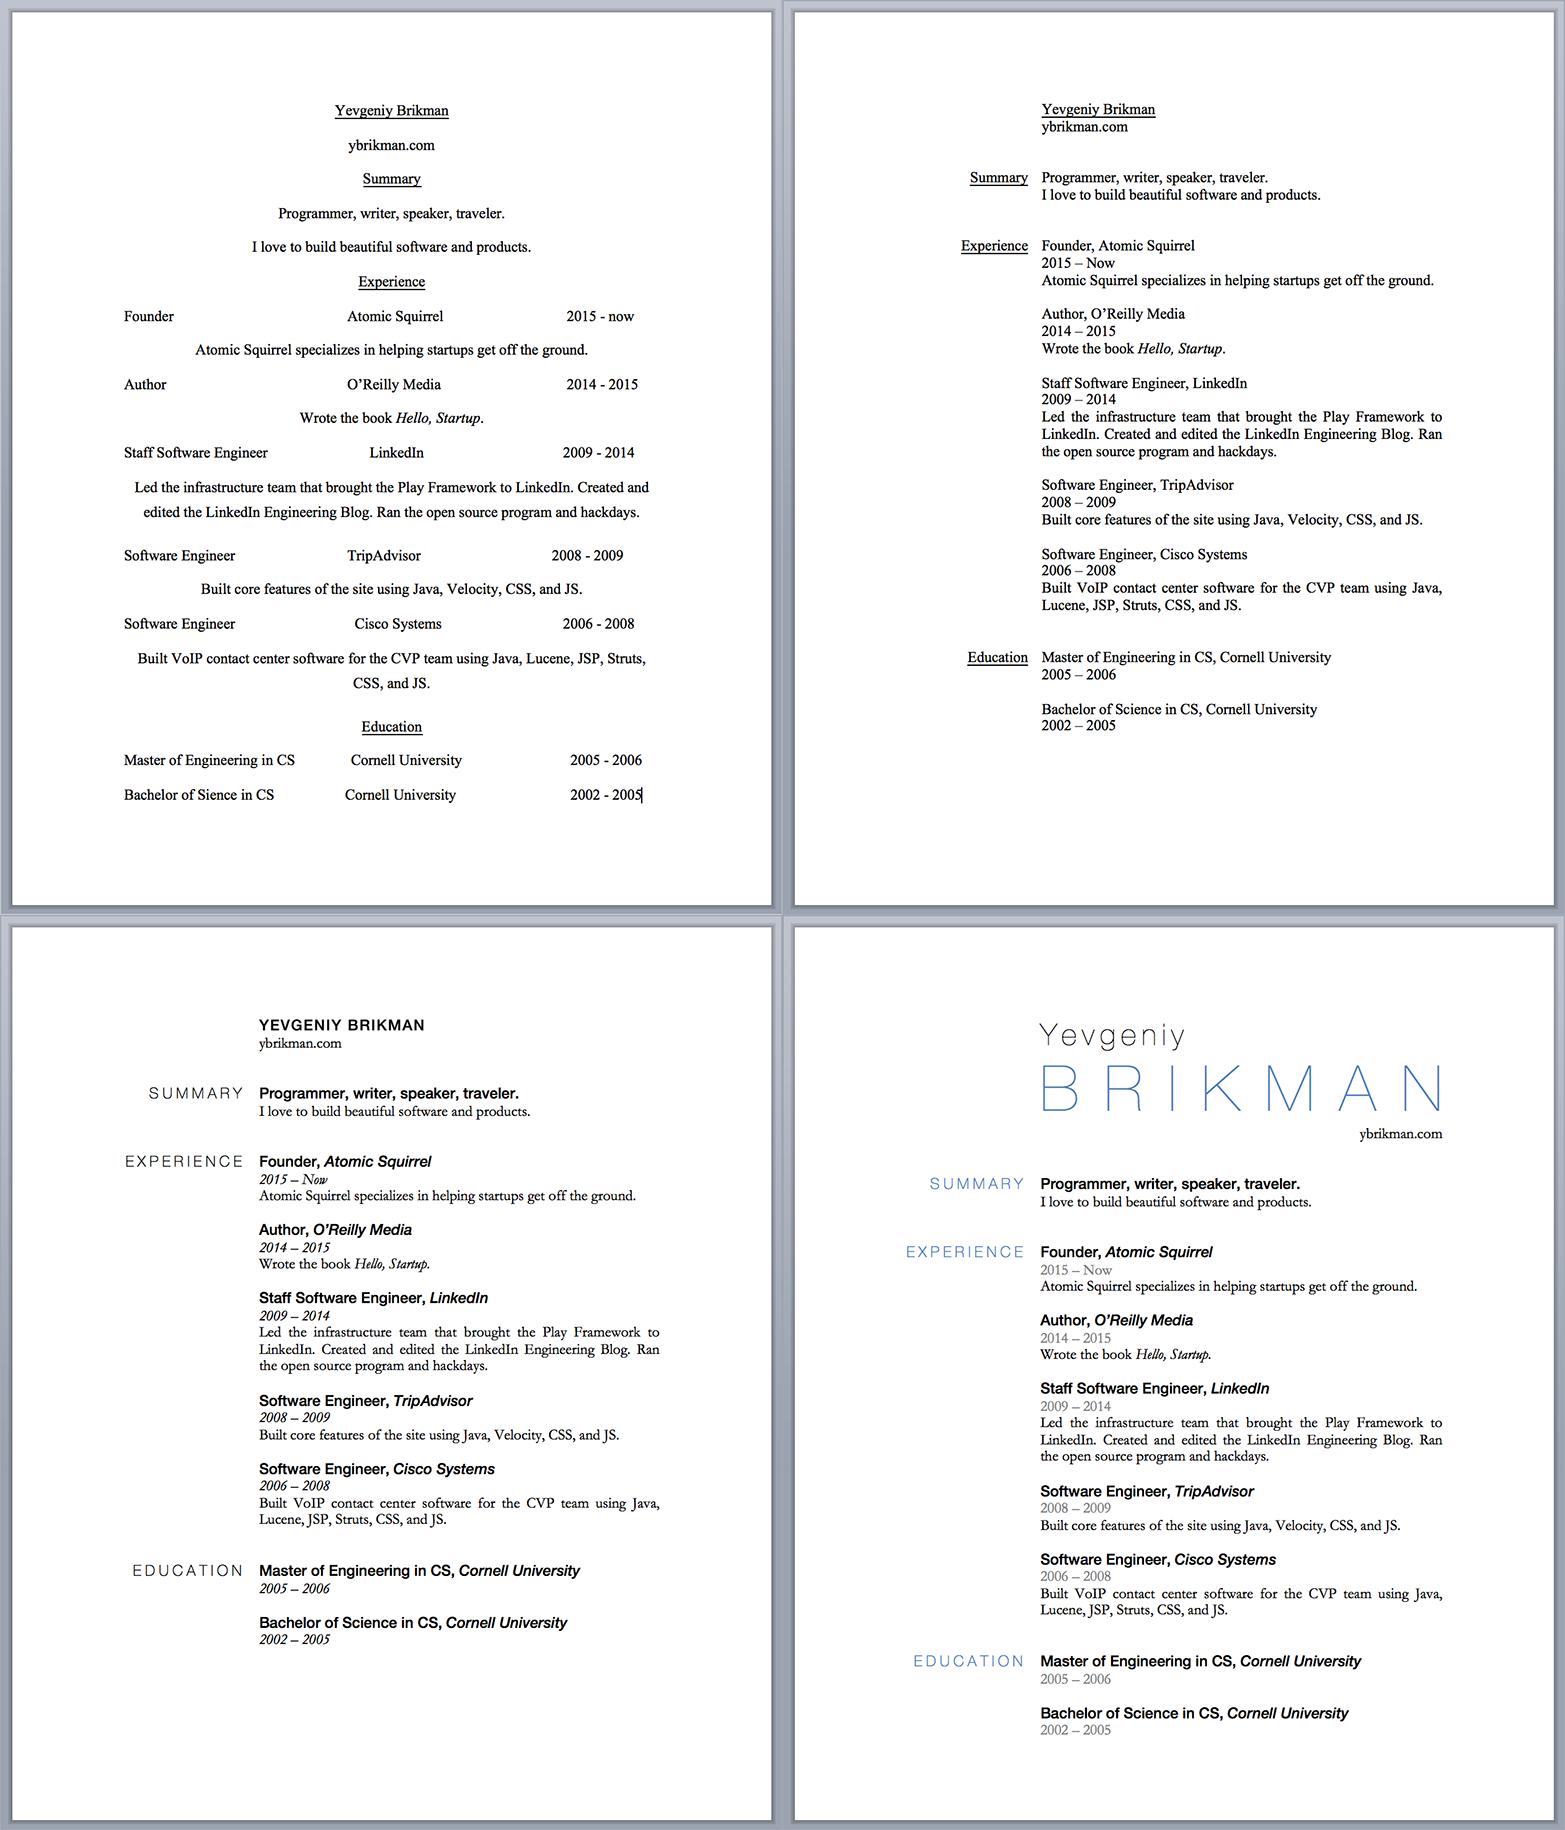 The progression of the resume design.